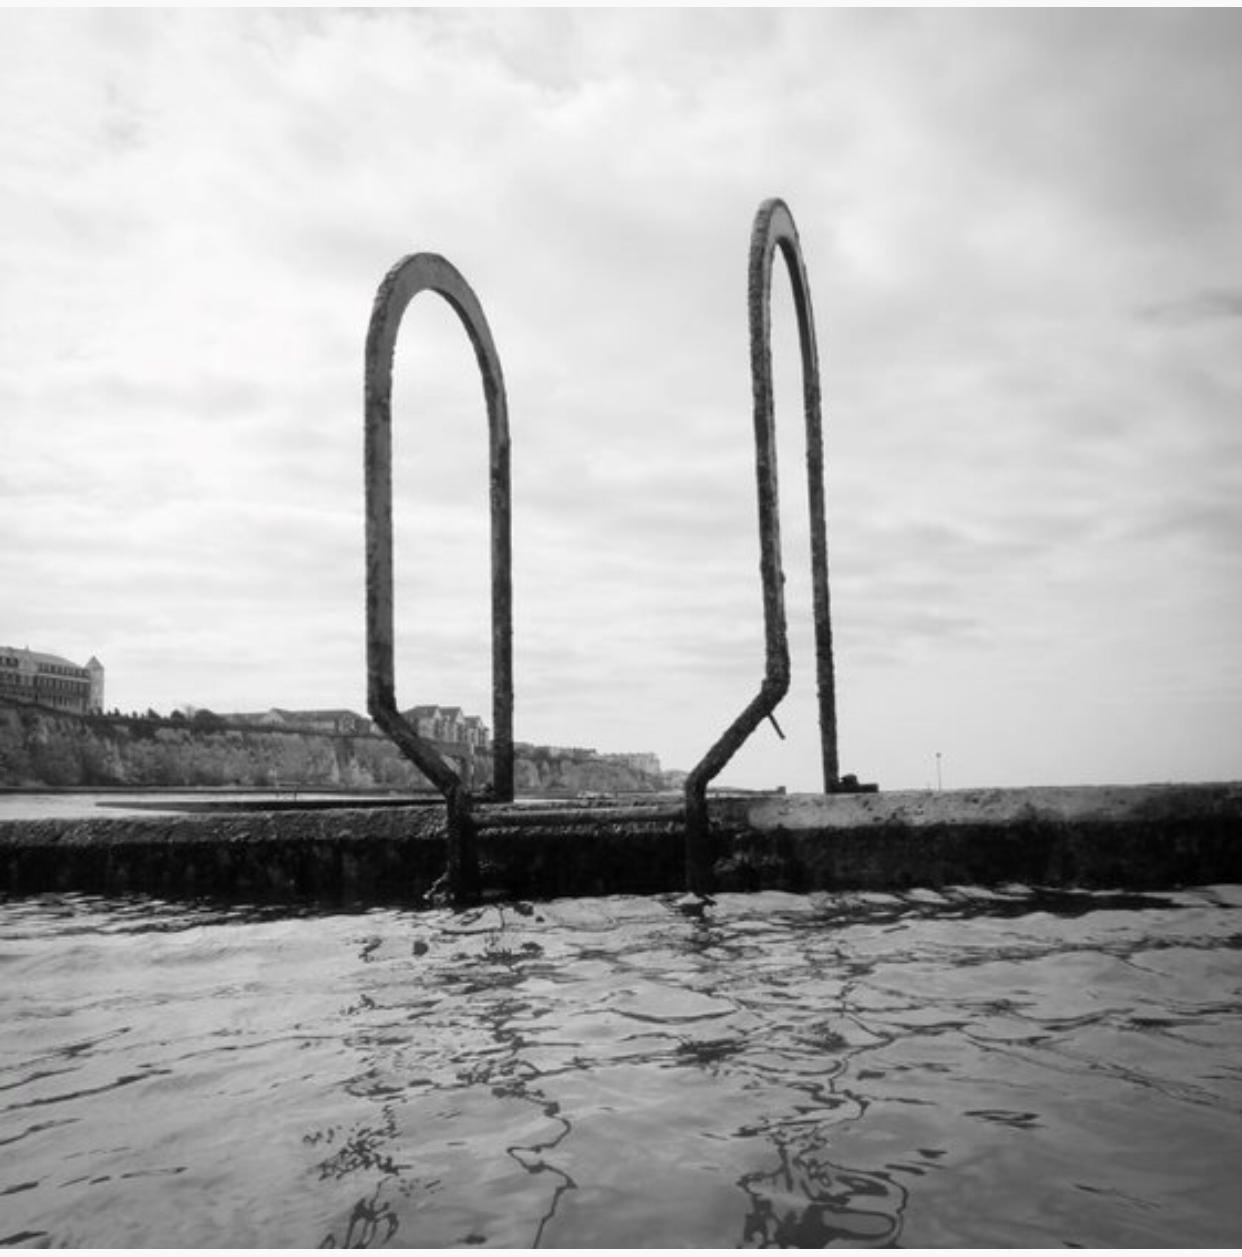 Swimming in the sea in the UK-676a1844-e6c1-4827-aa53-1e6ed0233f36-jpeg